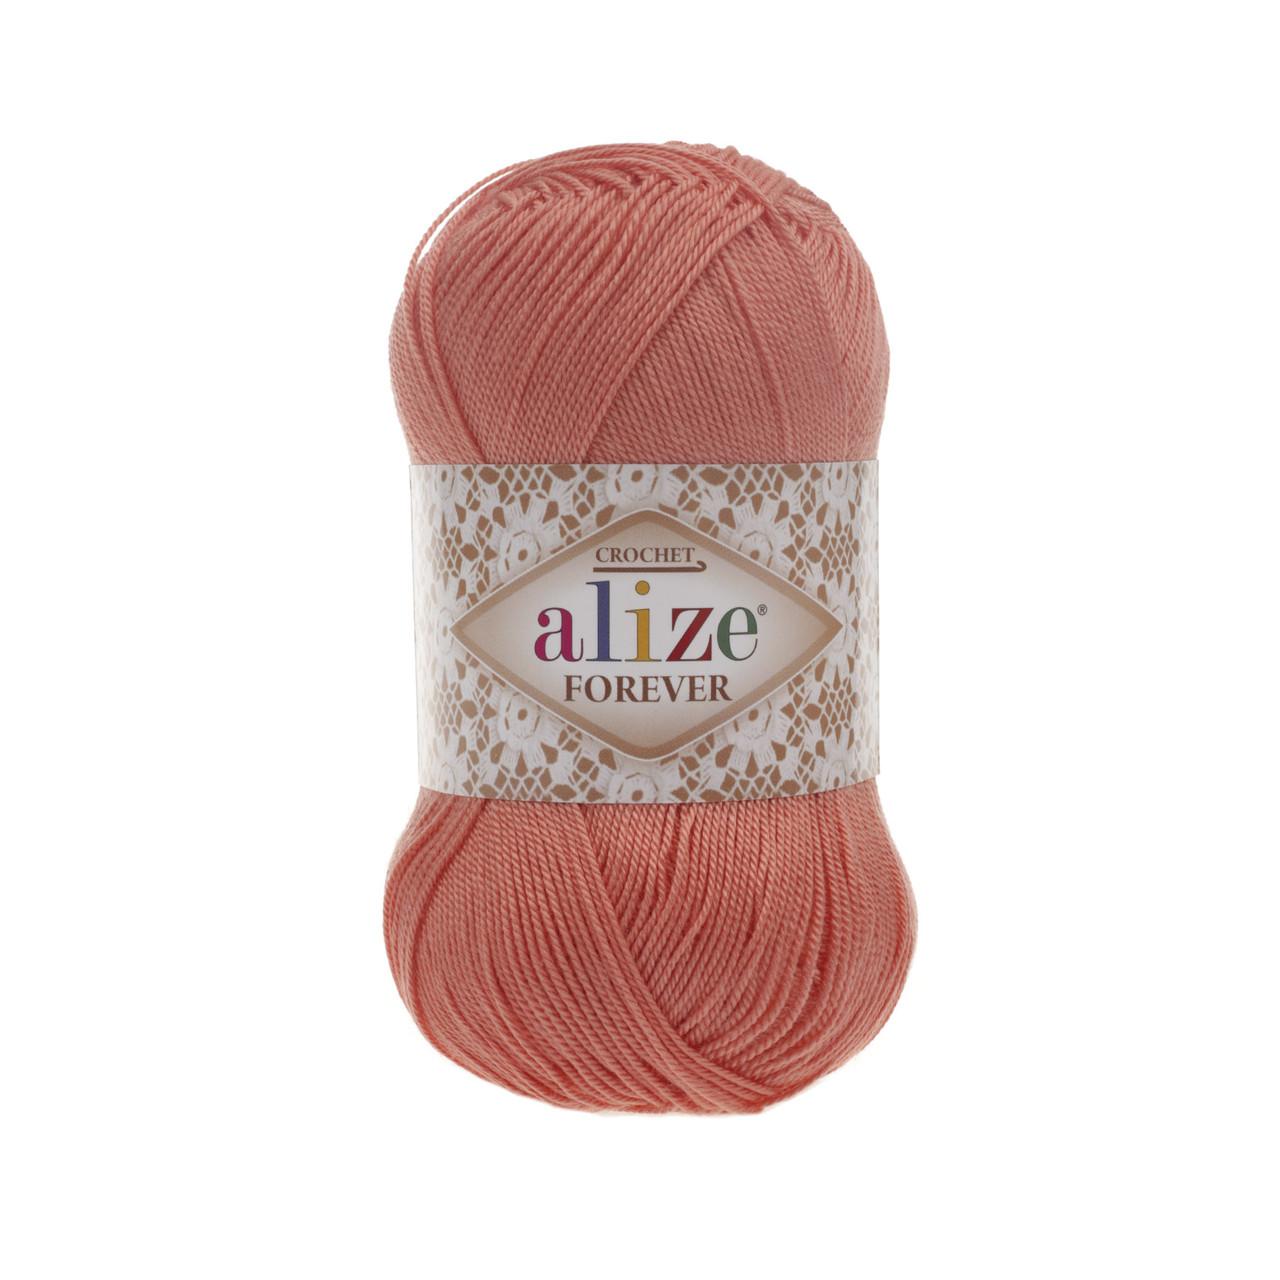 Пряжа Ализе Форевер Alize Forever, цвет №619 коралловый